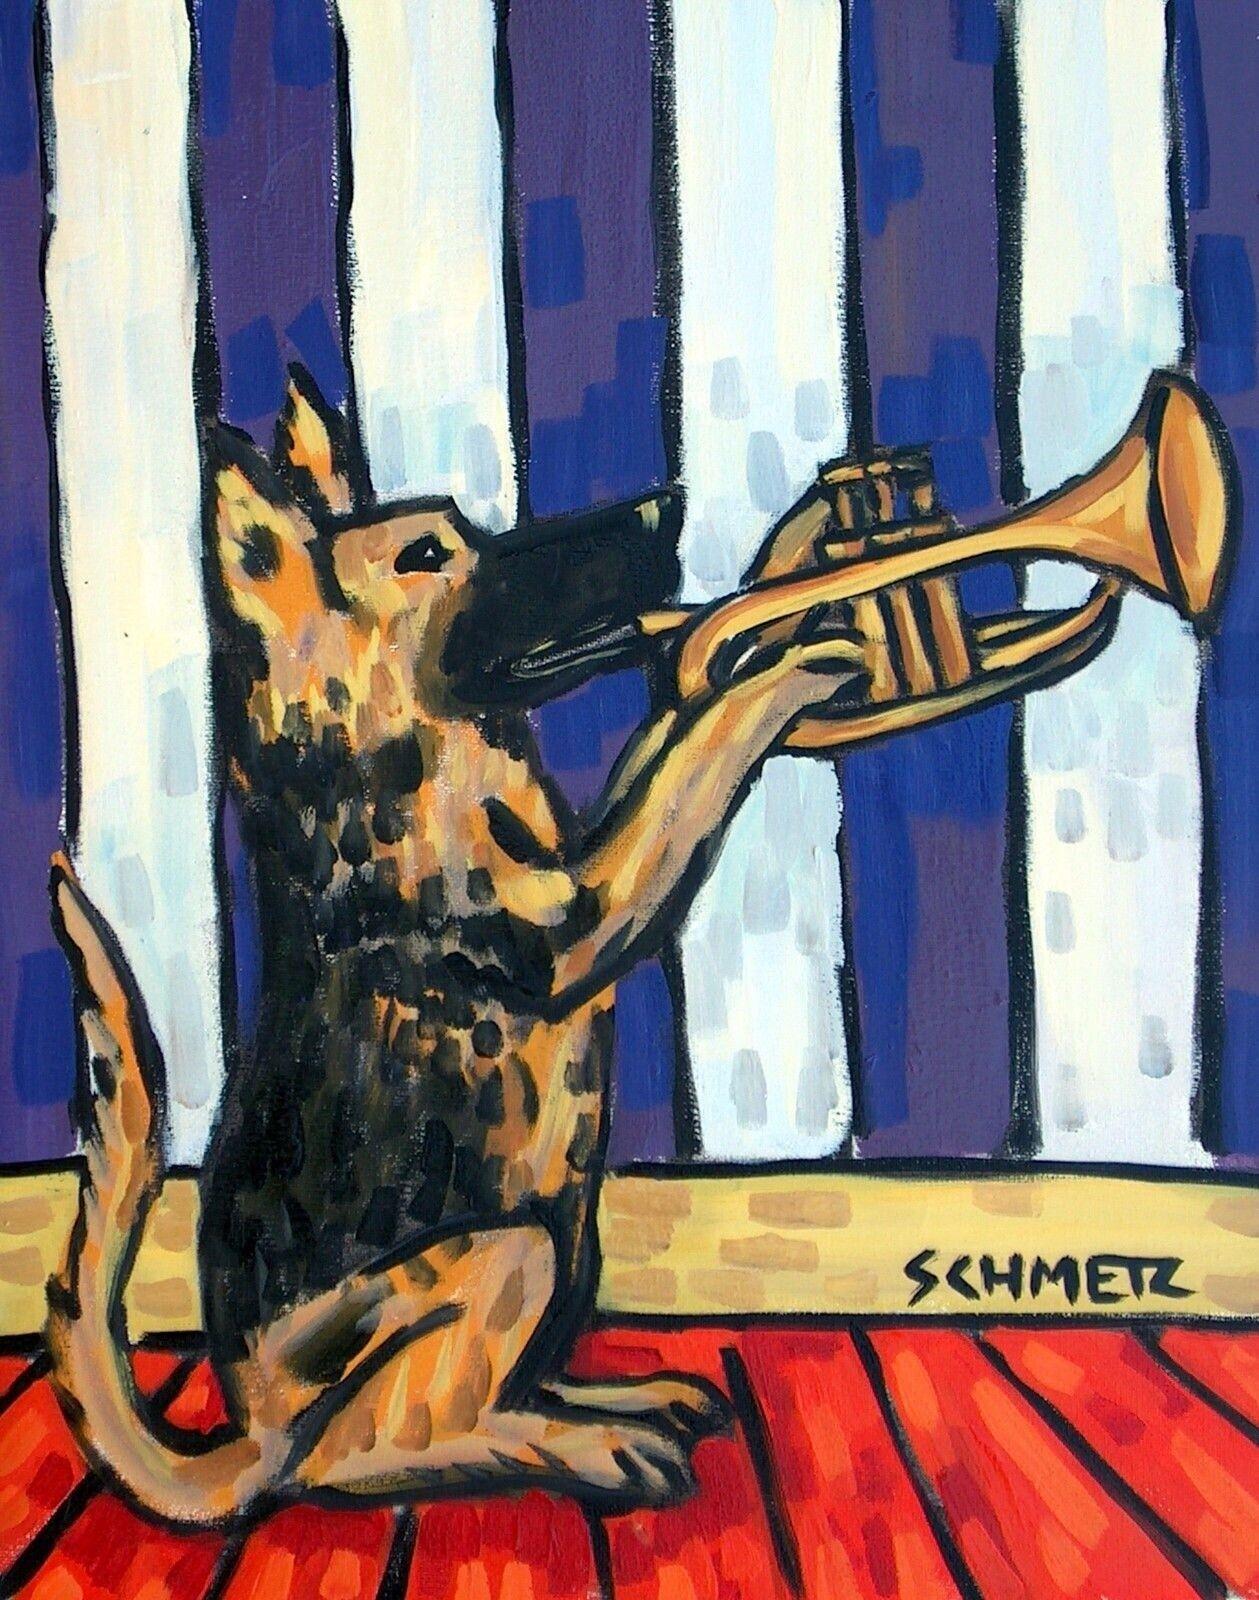 bulldog flossing dog art print 13x19 animal gift picture giclee impressionism